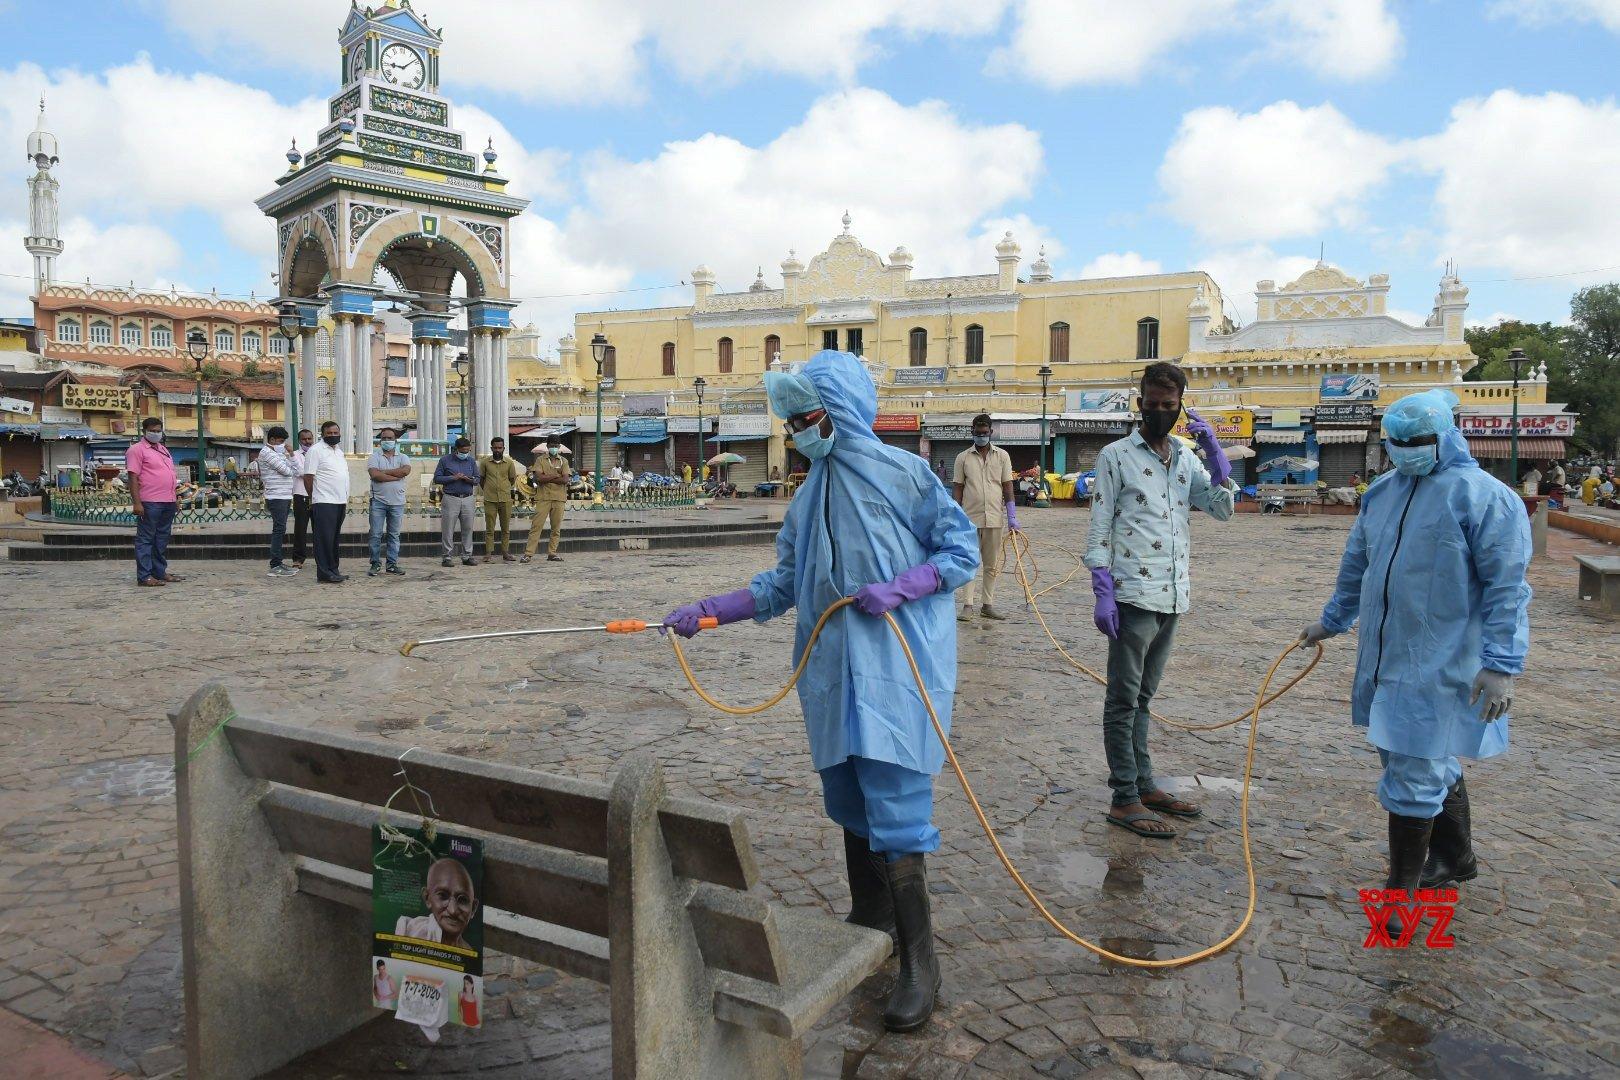 Ban on tourists visiting Covid-hit Mysuru lifted for Dasara